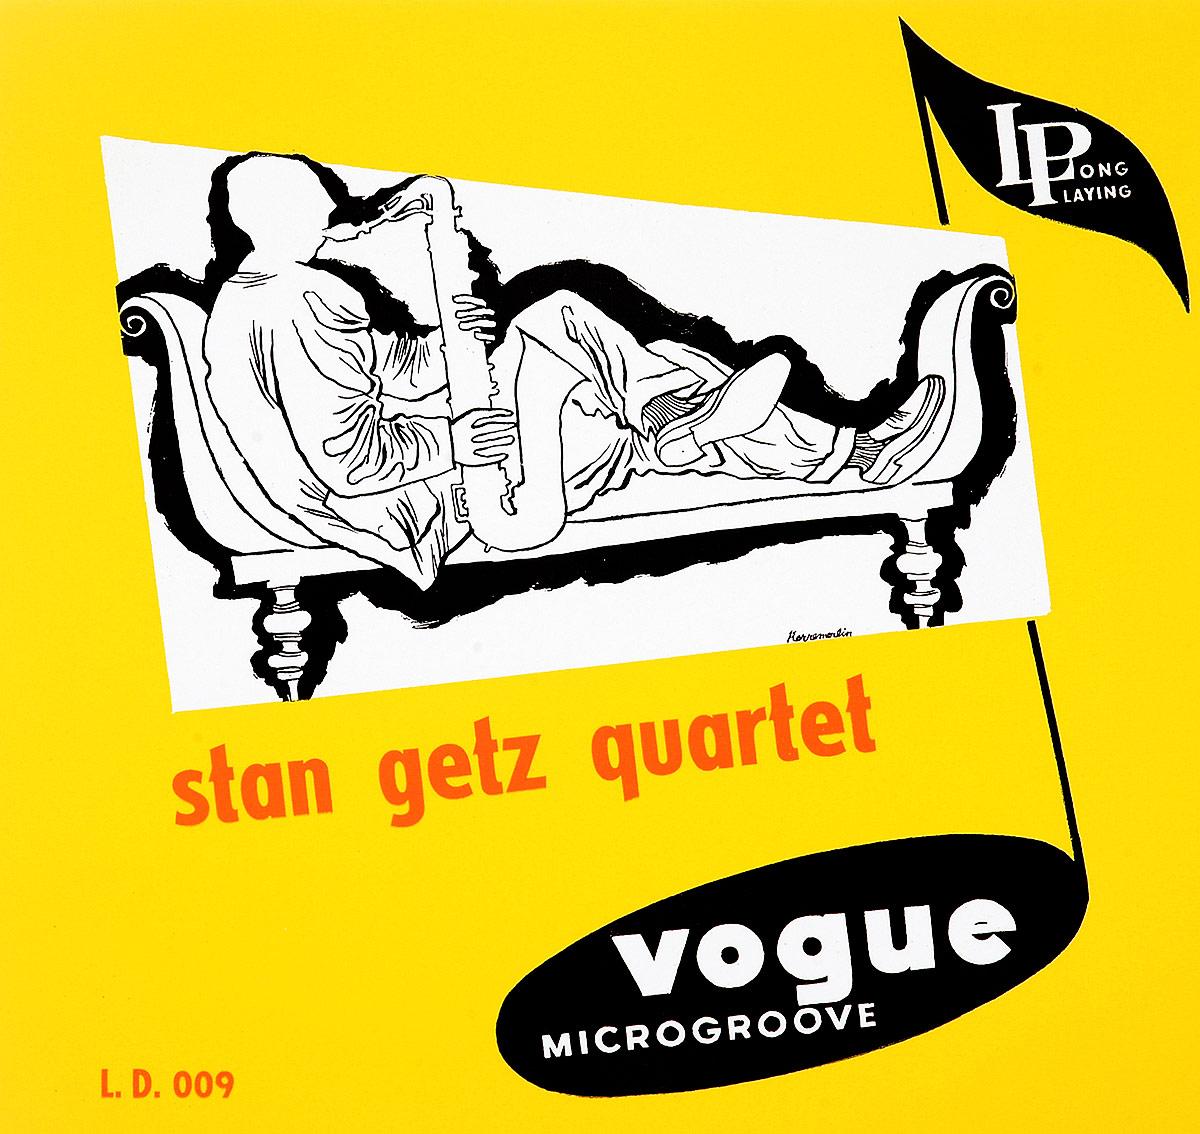 Стэн Гетц Stan Getz. Stan Getz Quartet (LP) hyundai getz с пробегом в питере